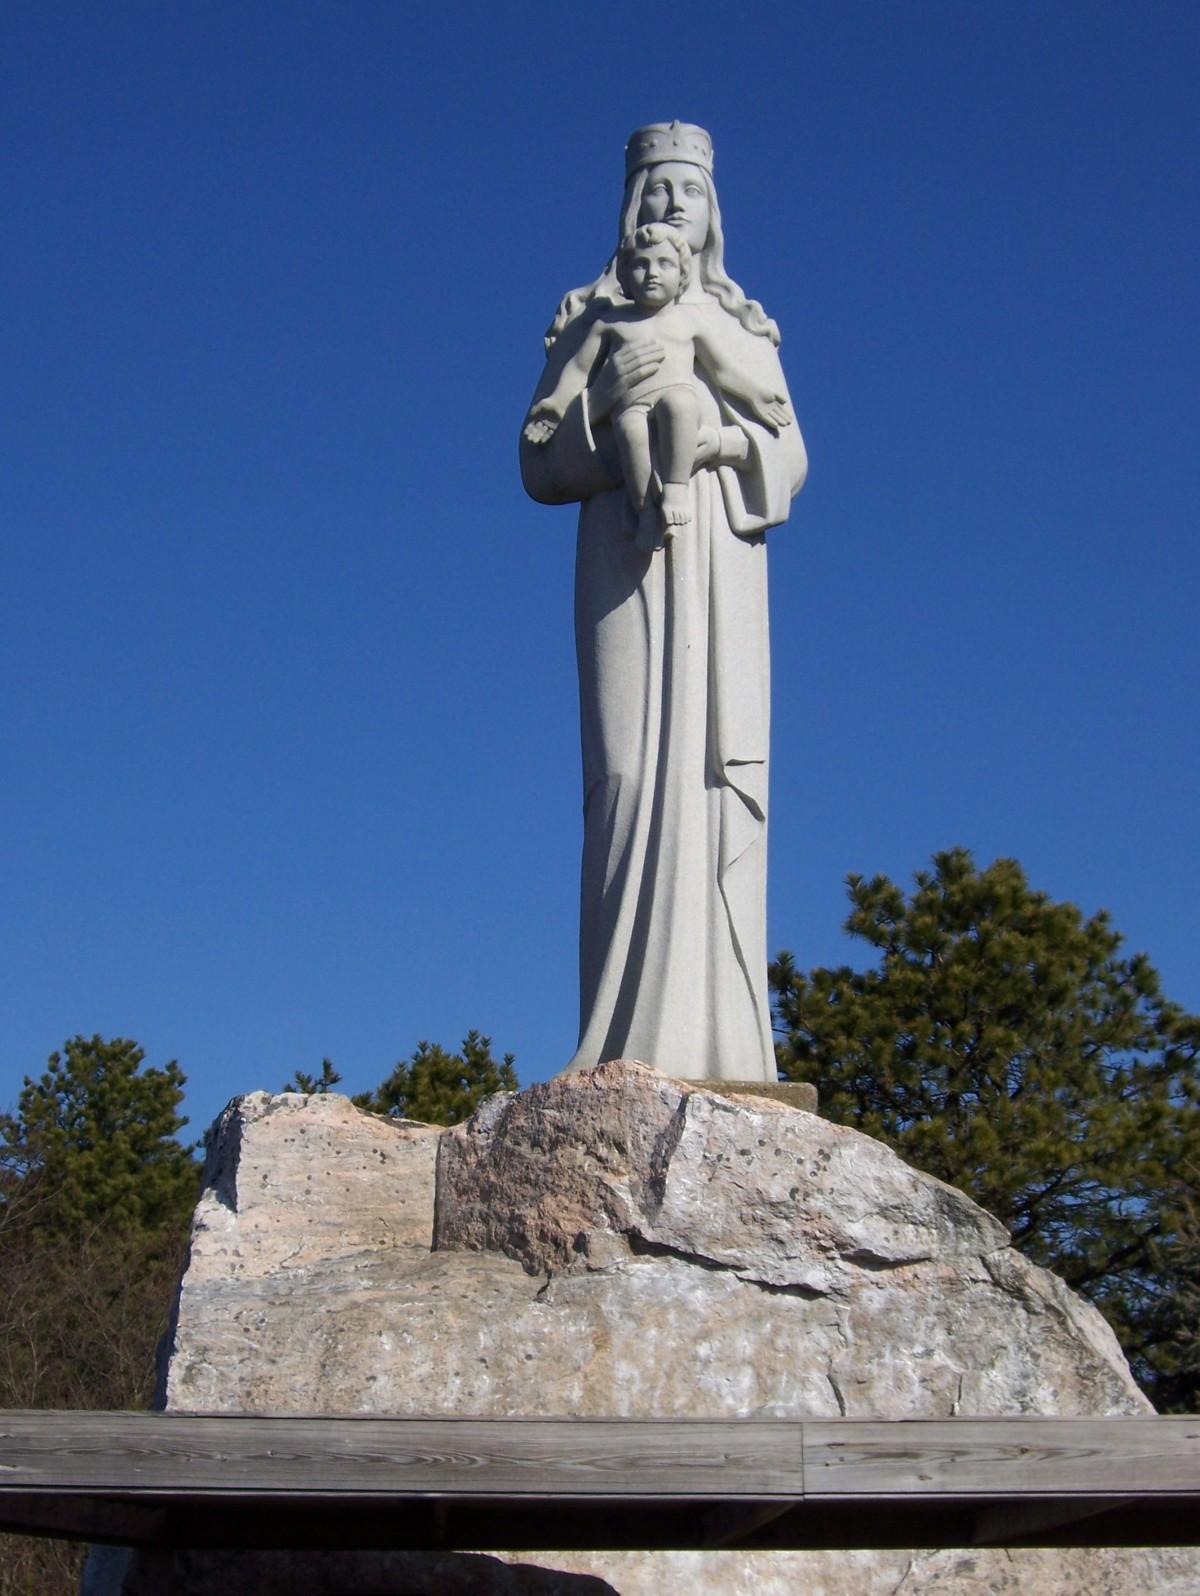 Photography Statue Monument Gothic Religion Sky Skies: Free Images : Monument, Statue, Religion, Italy, Sculpture